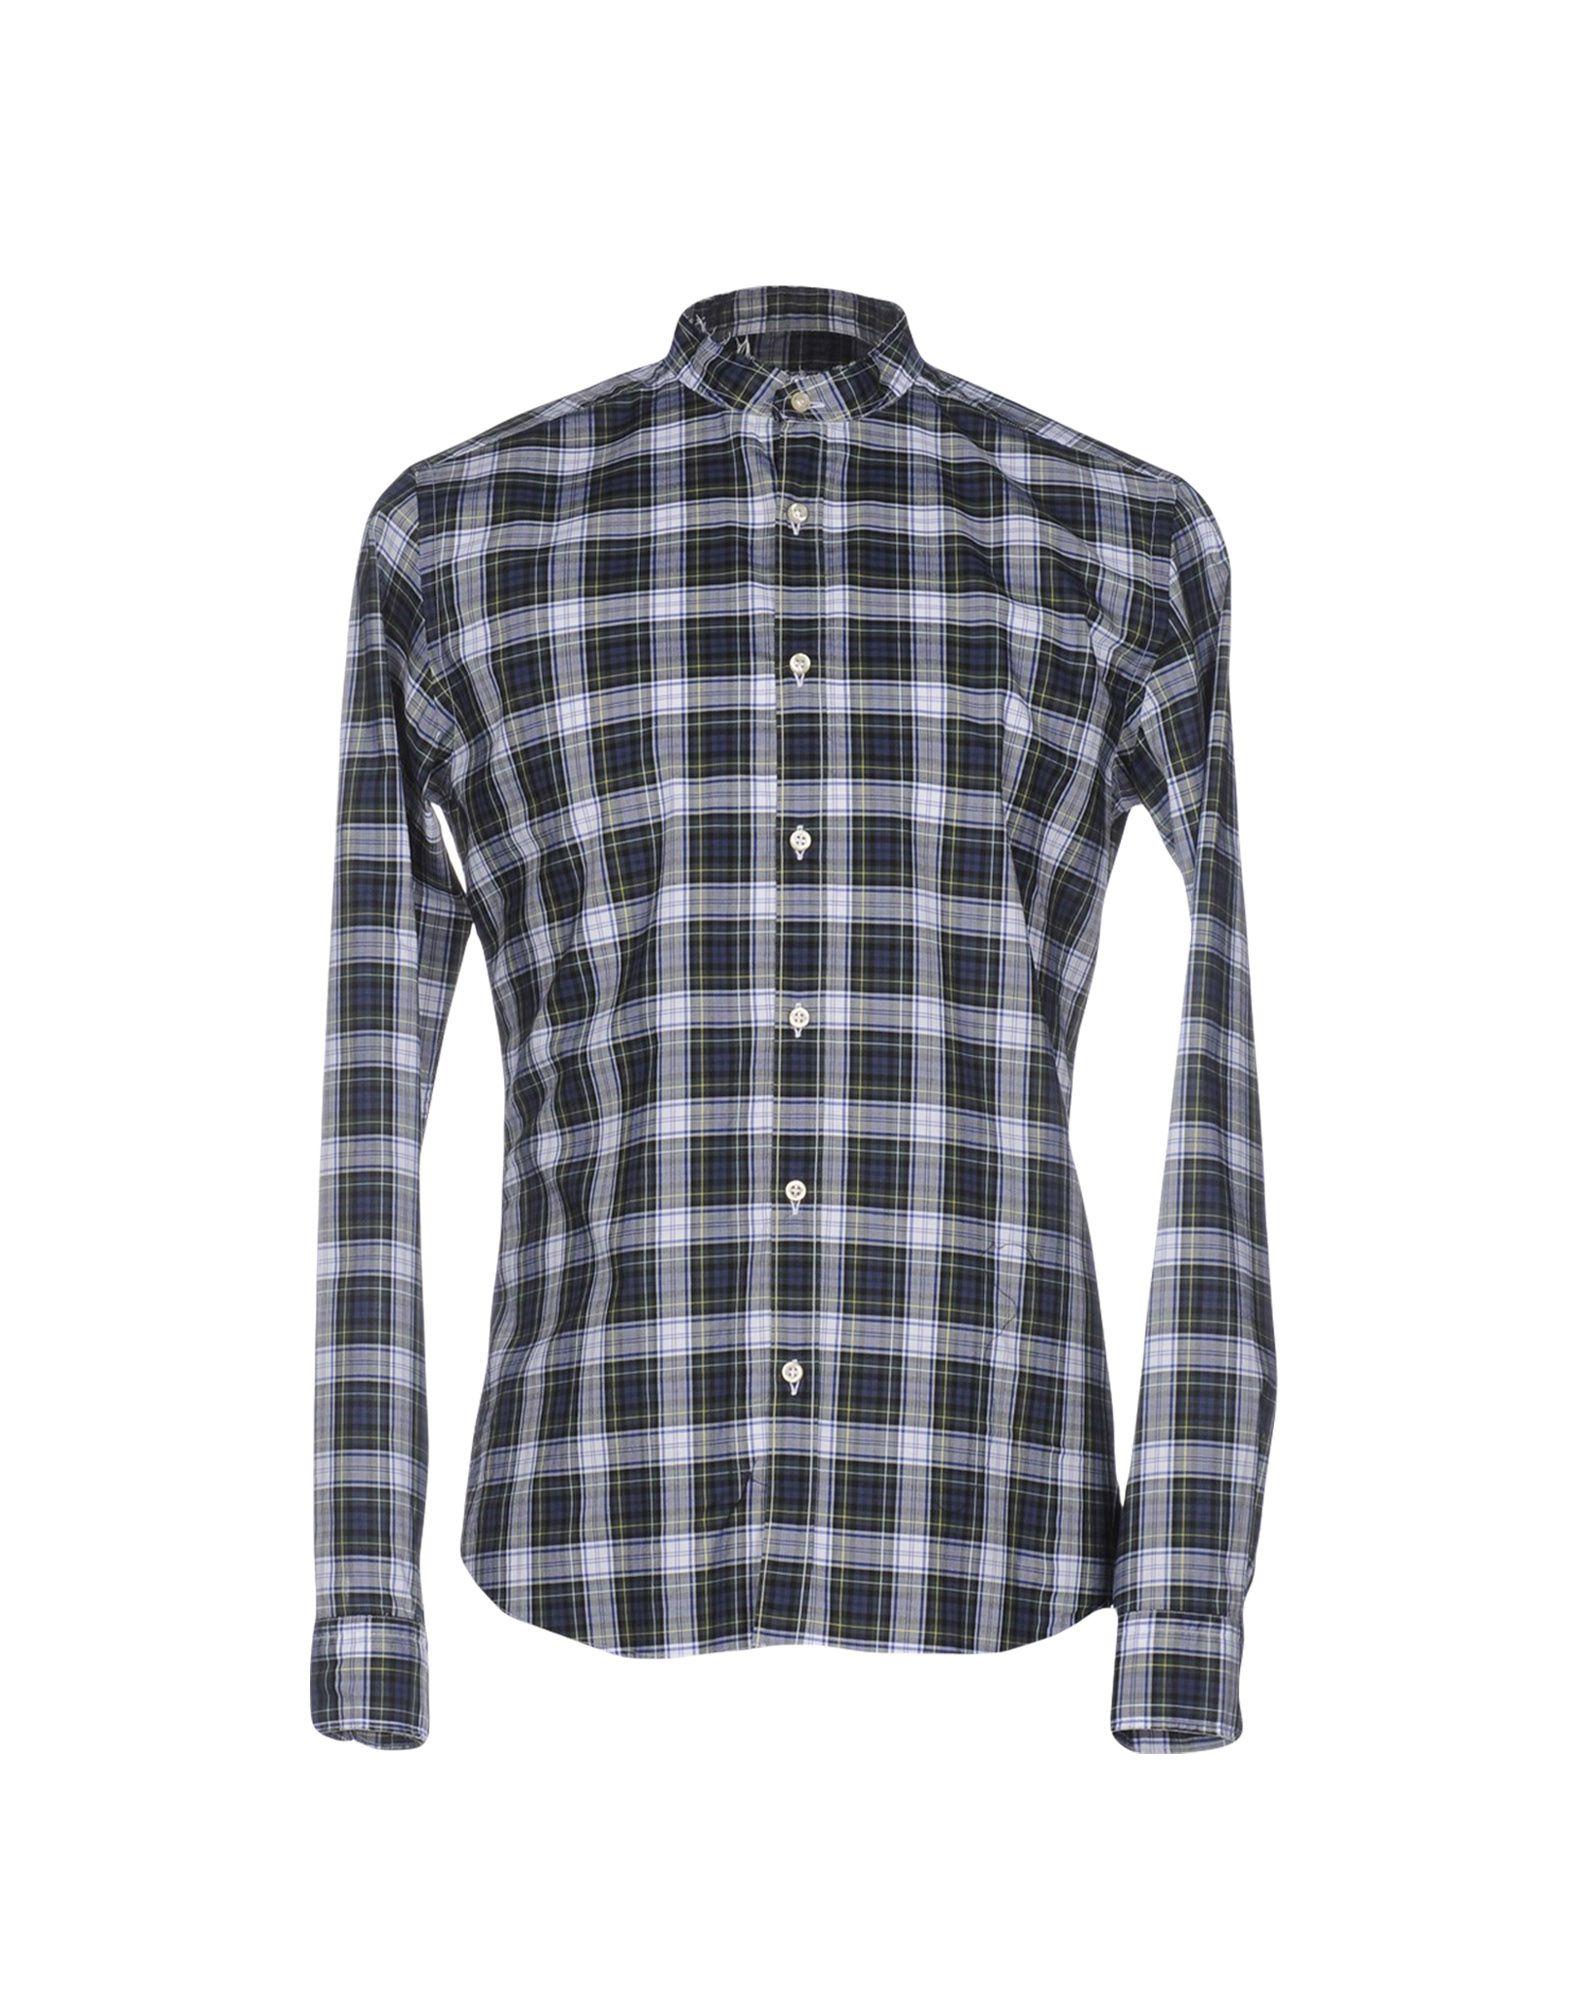 J. FERRETTI Pубашка j shirt pубашка